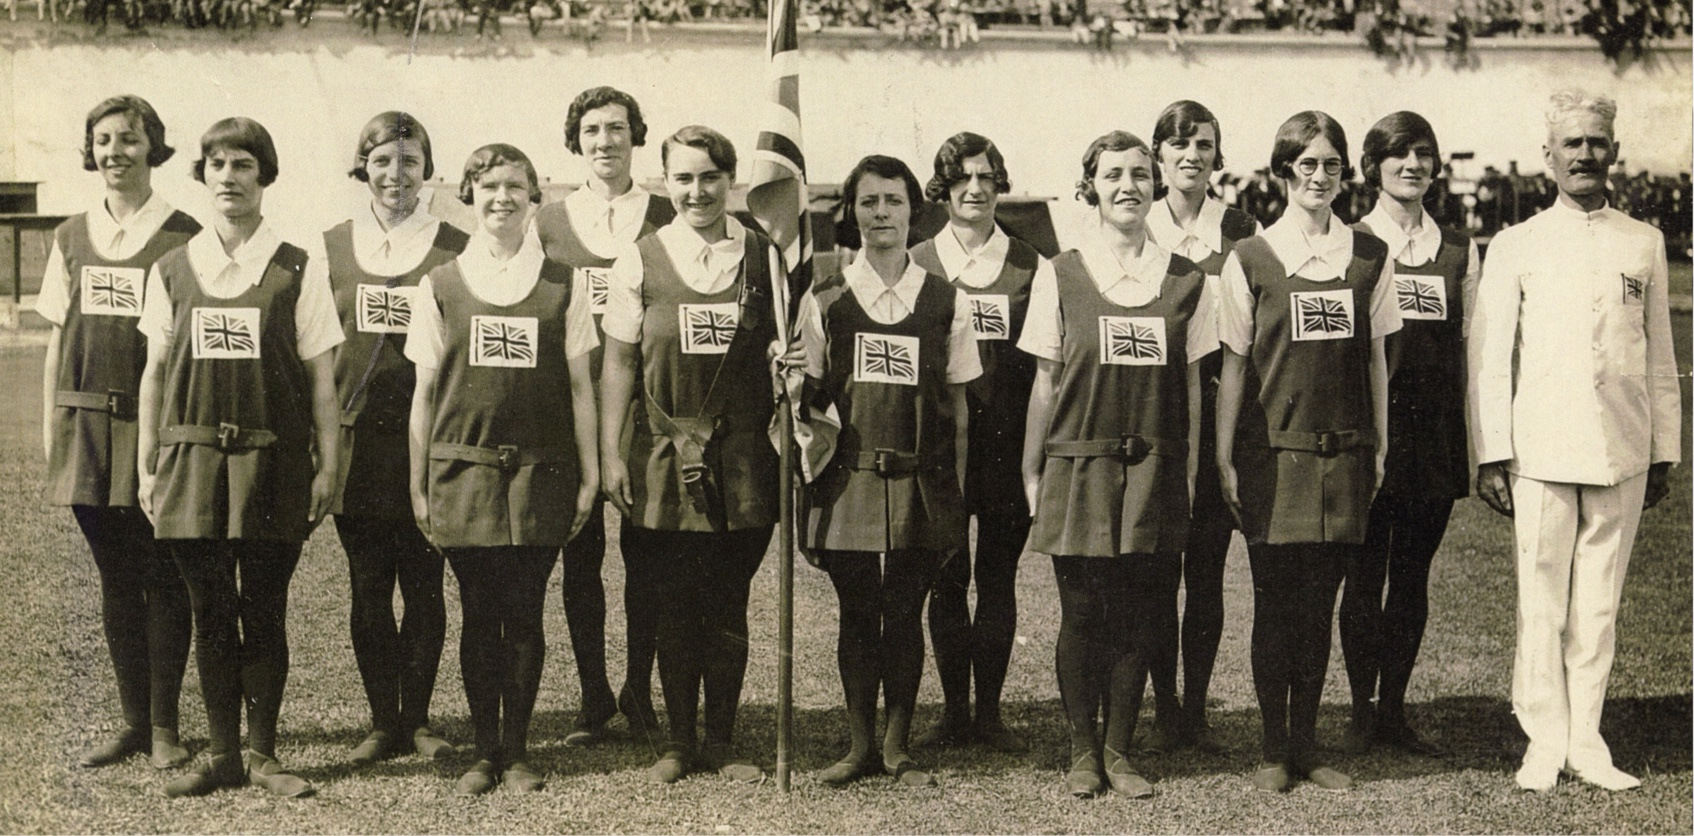 1928 Women's Gymnastics Team In Stadium - BG Archive